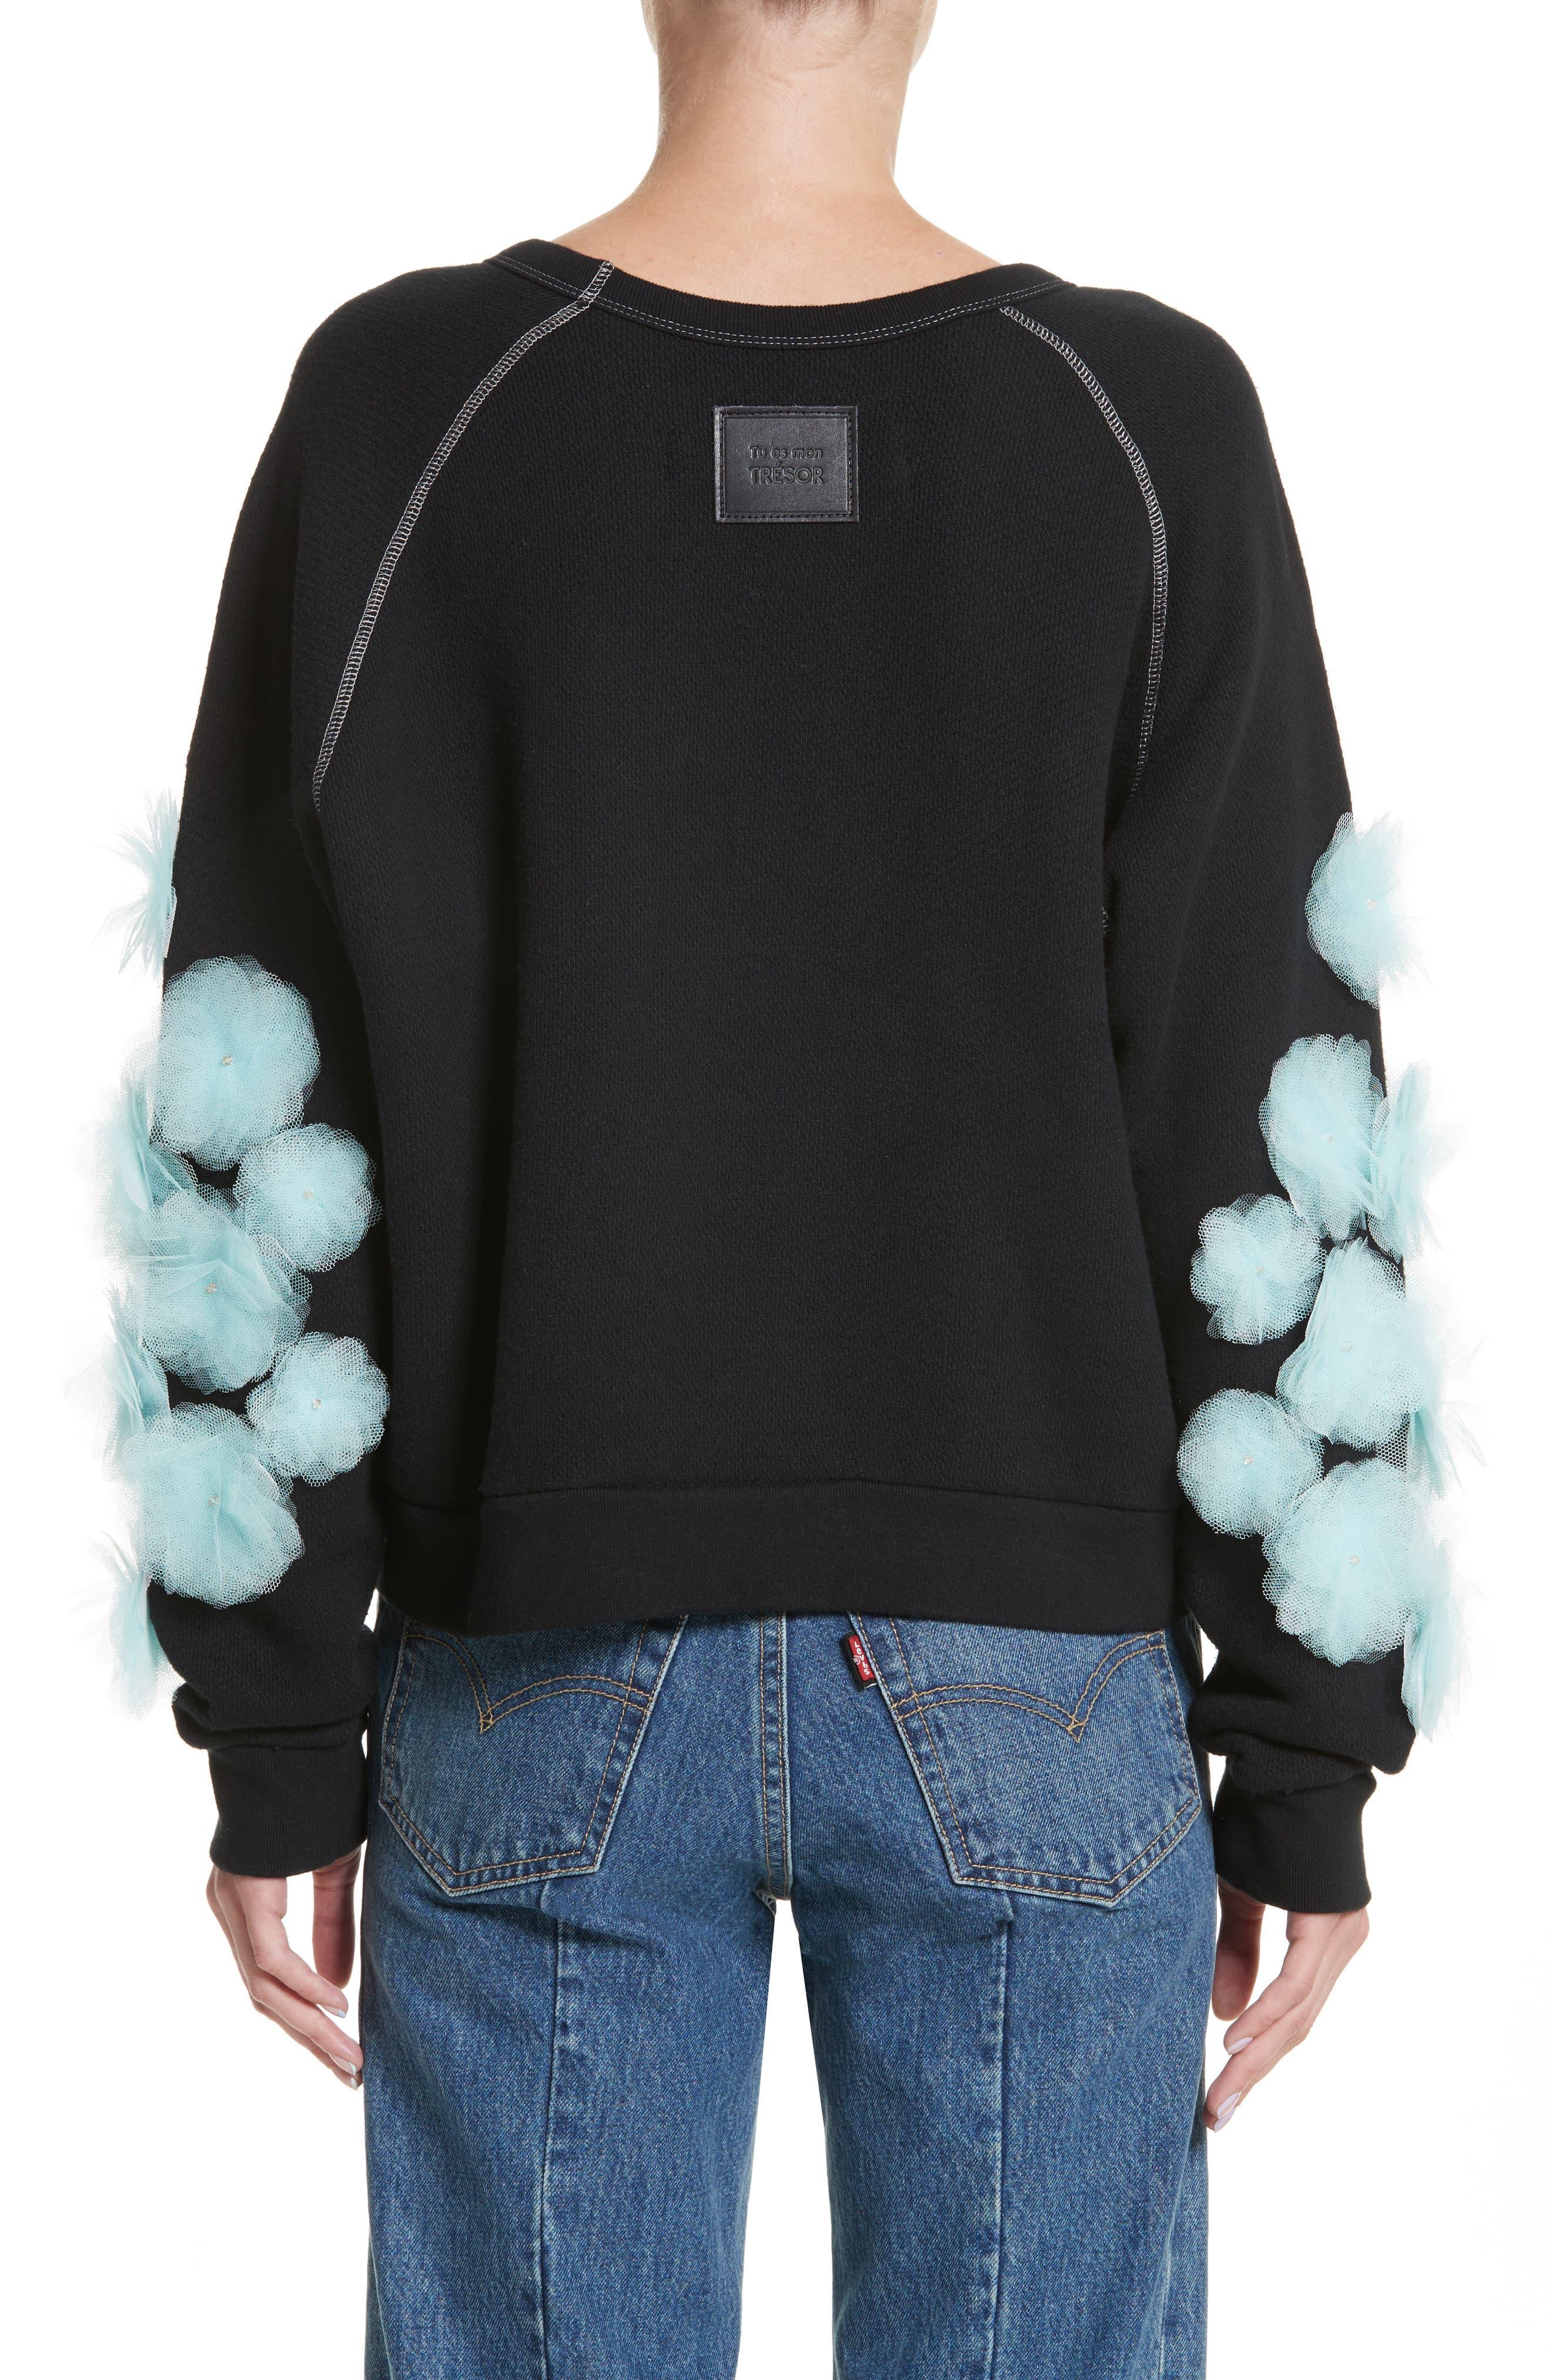 Tu es mon TRESOR Tulle Flower Sweatshirt,                             Alternate thumbnail 2, color,                             Black/ Mint Bkmi